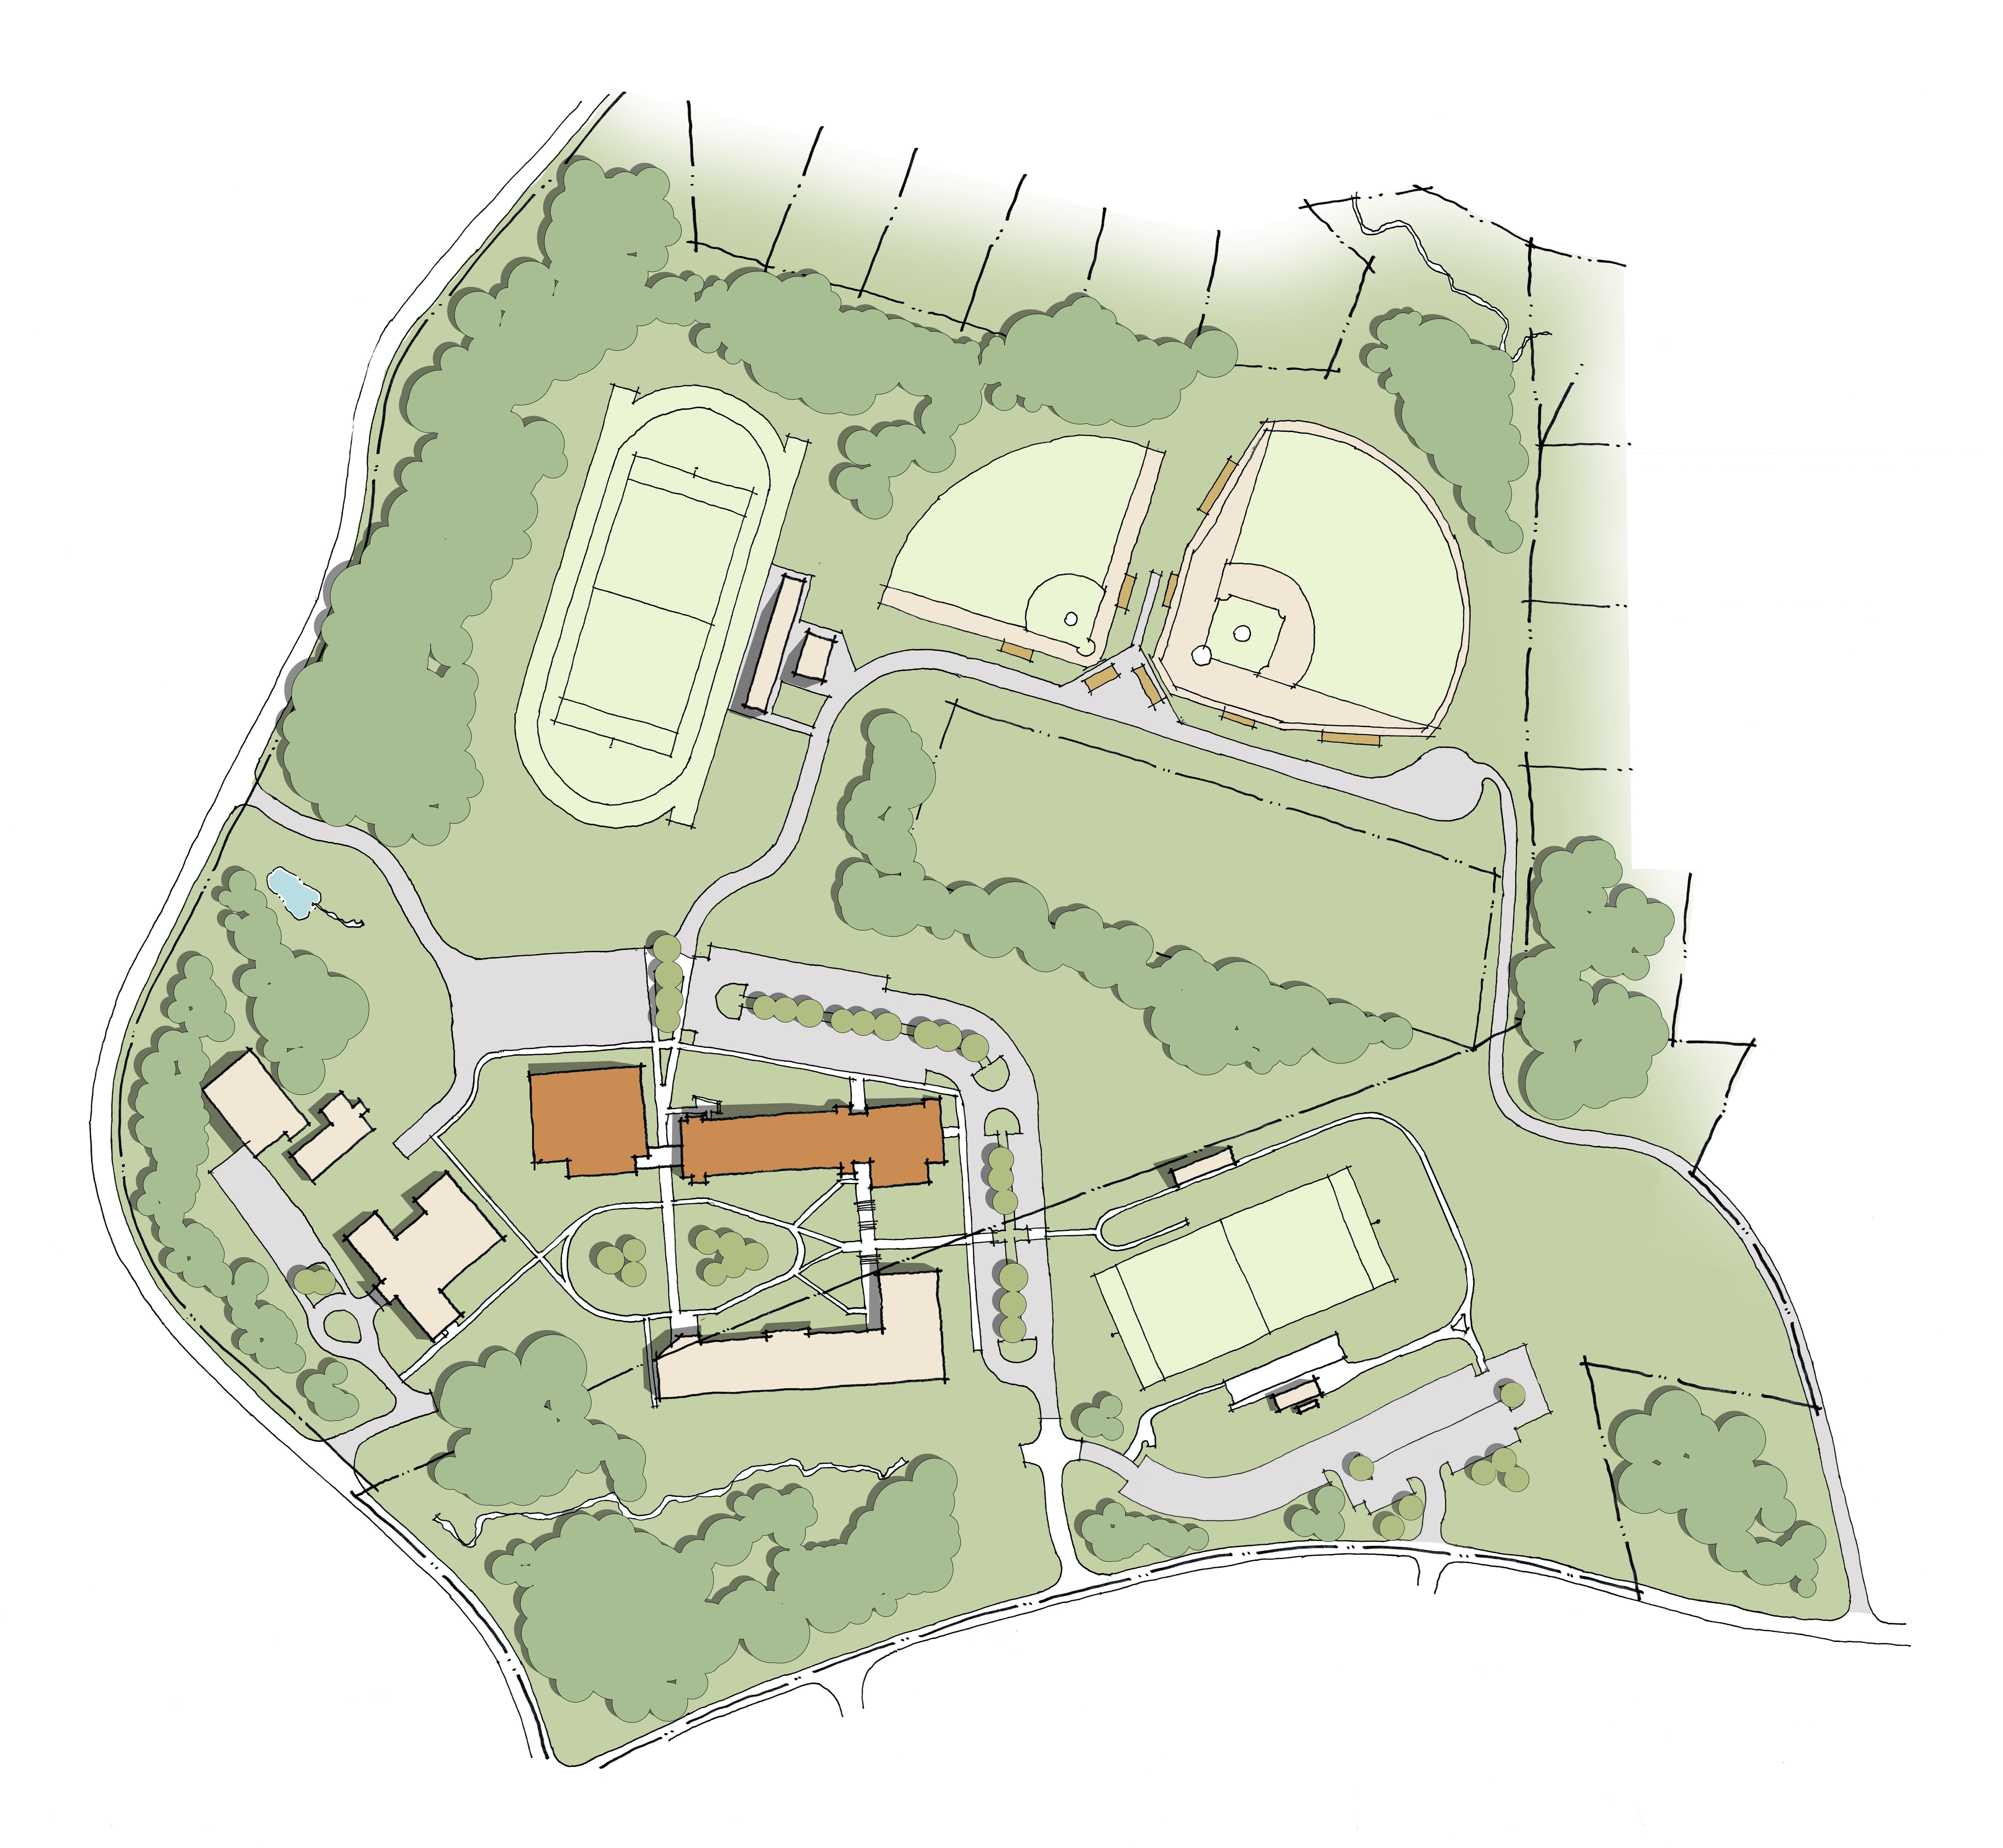 TJCA 2020 Vision Site Plan